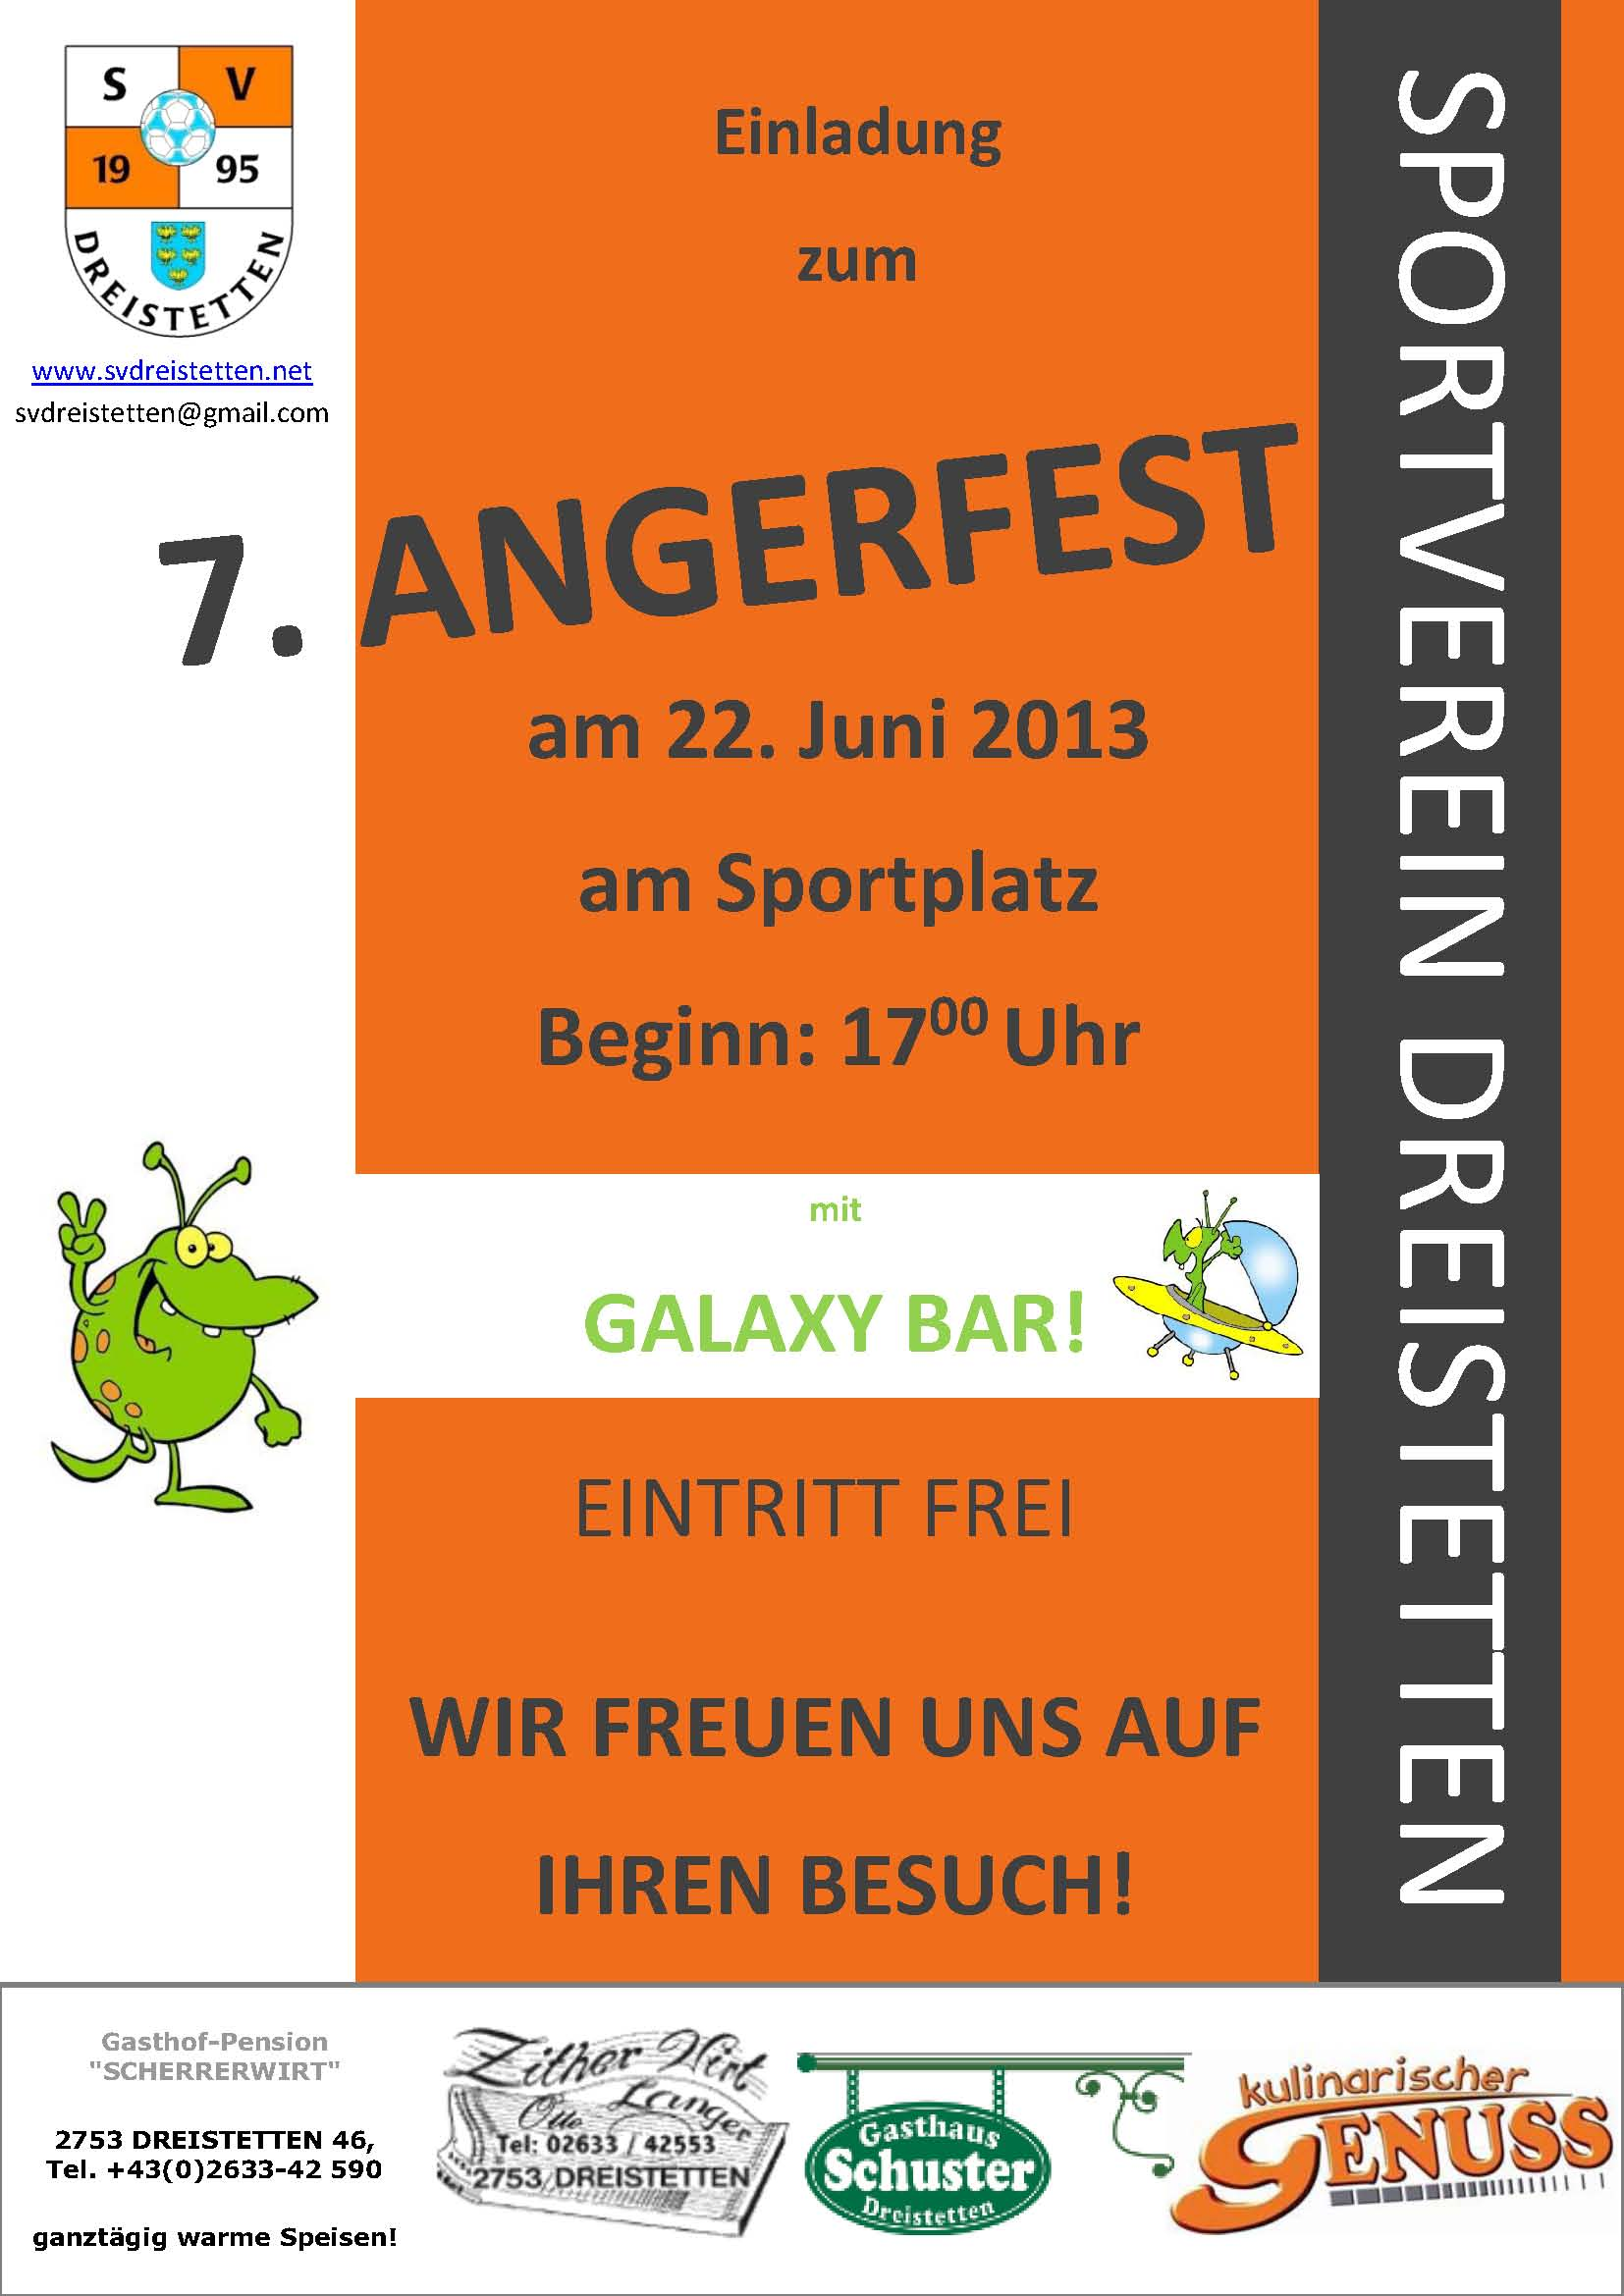 7. Angerfest 2013